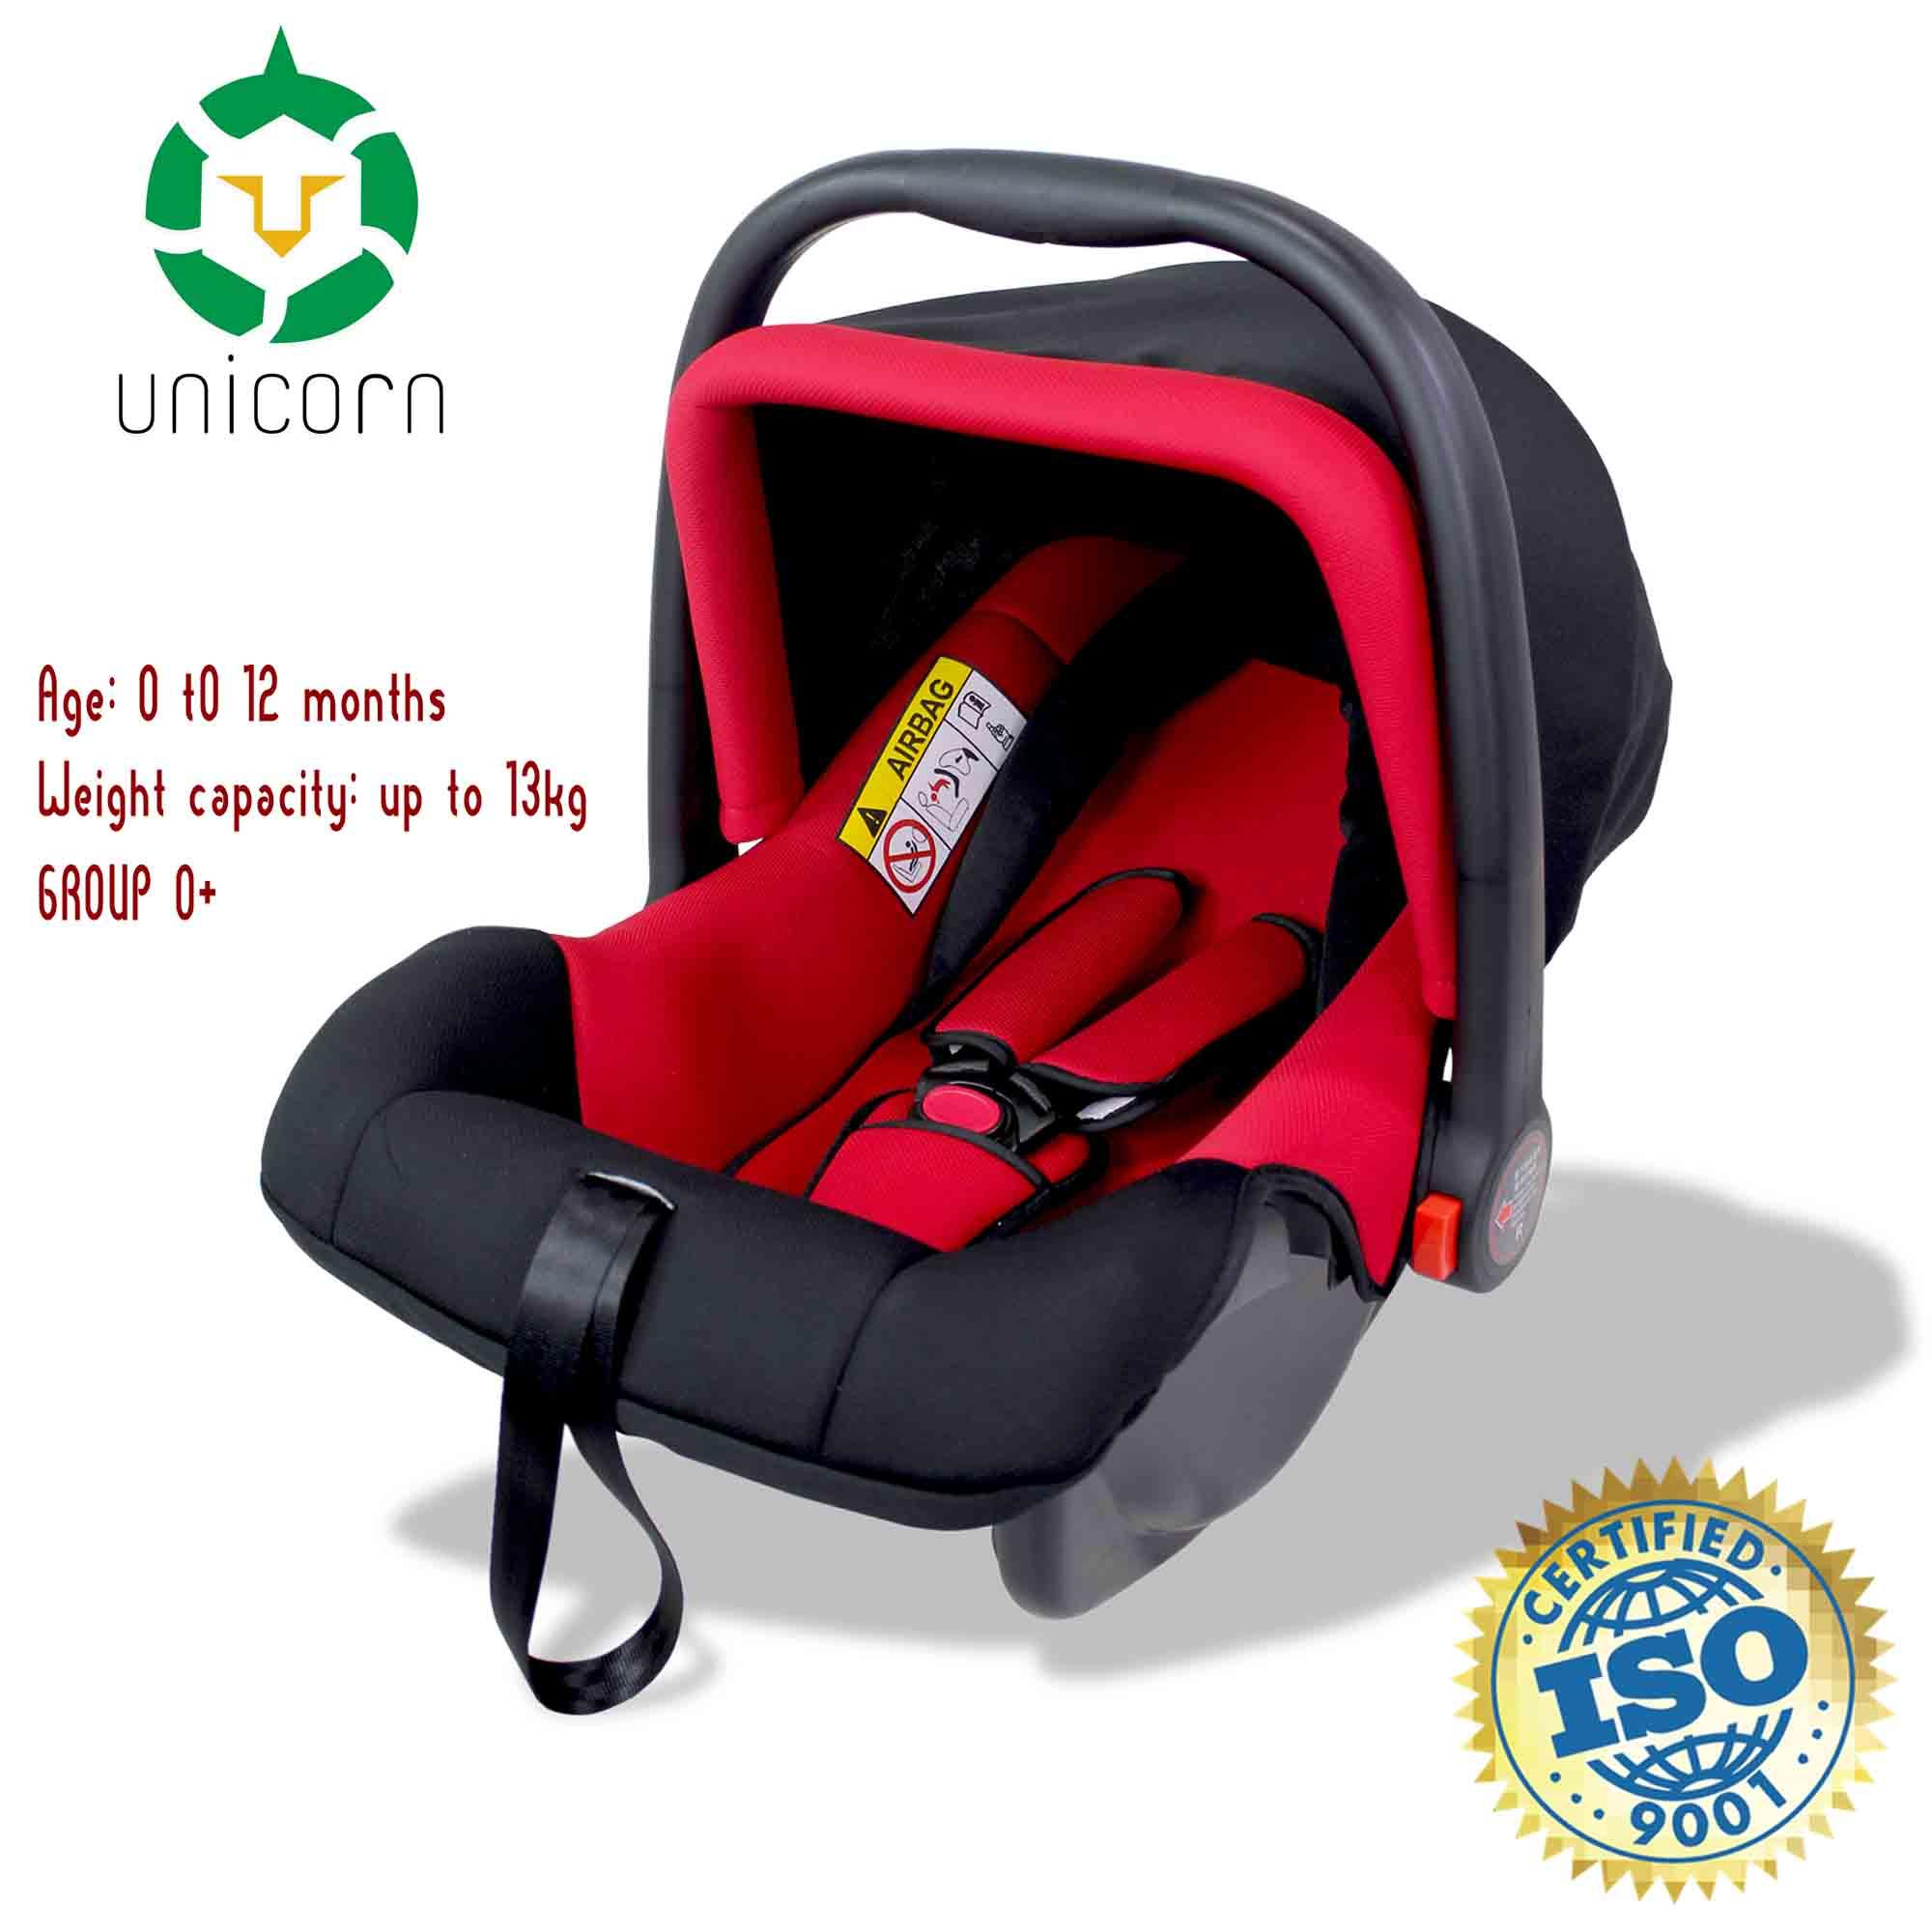 Car Seat Head Support For NewbornsInfant InsertInfant